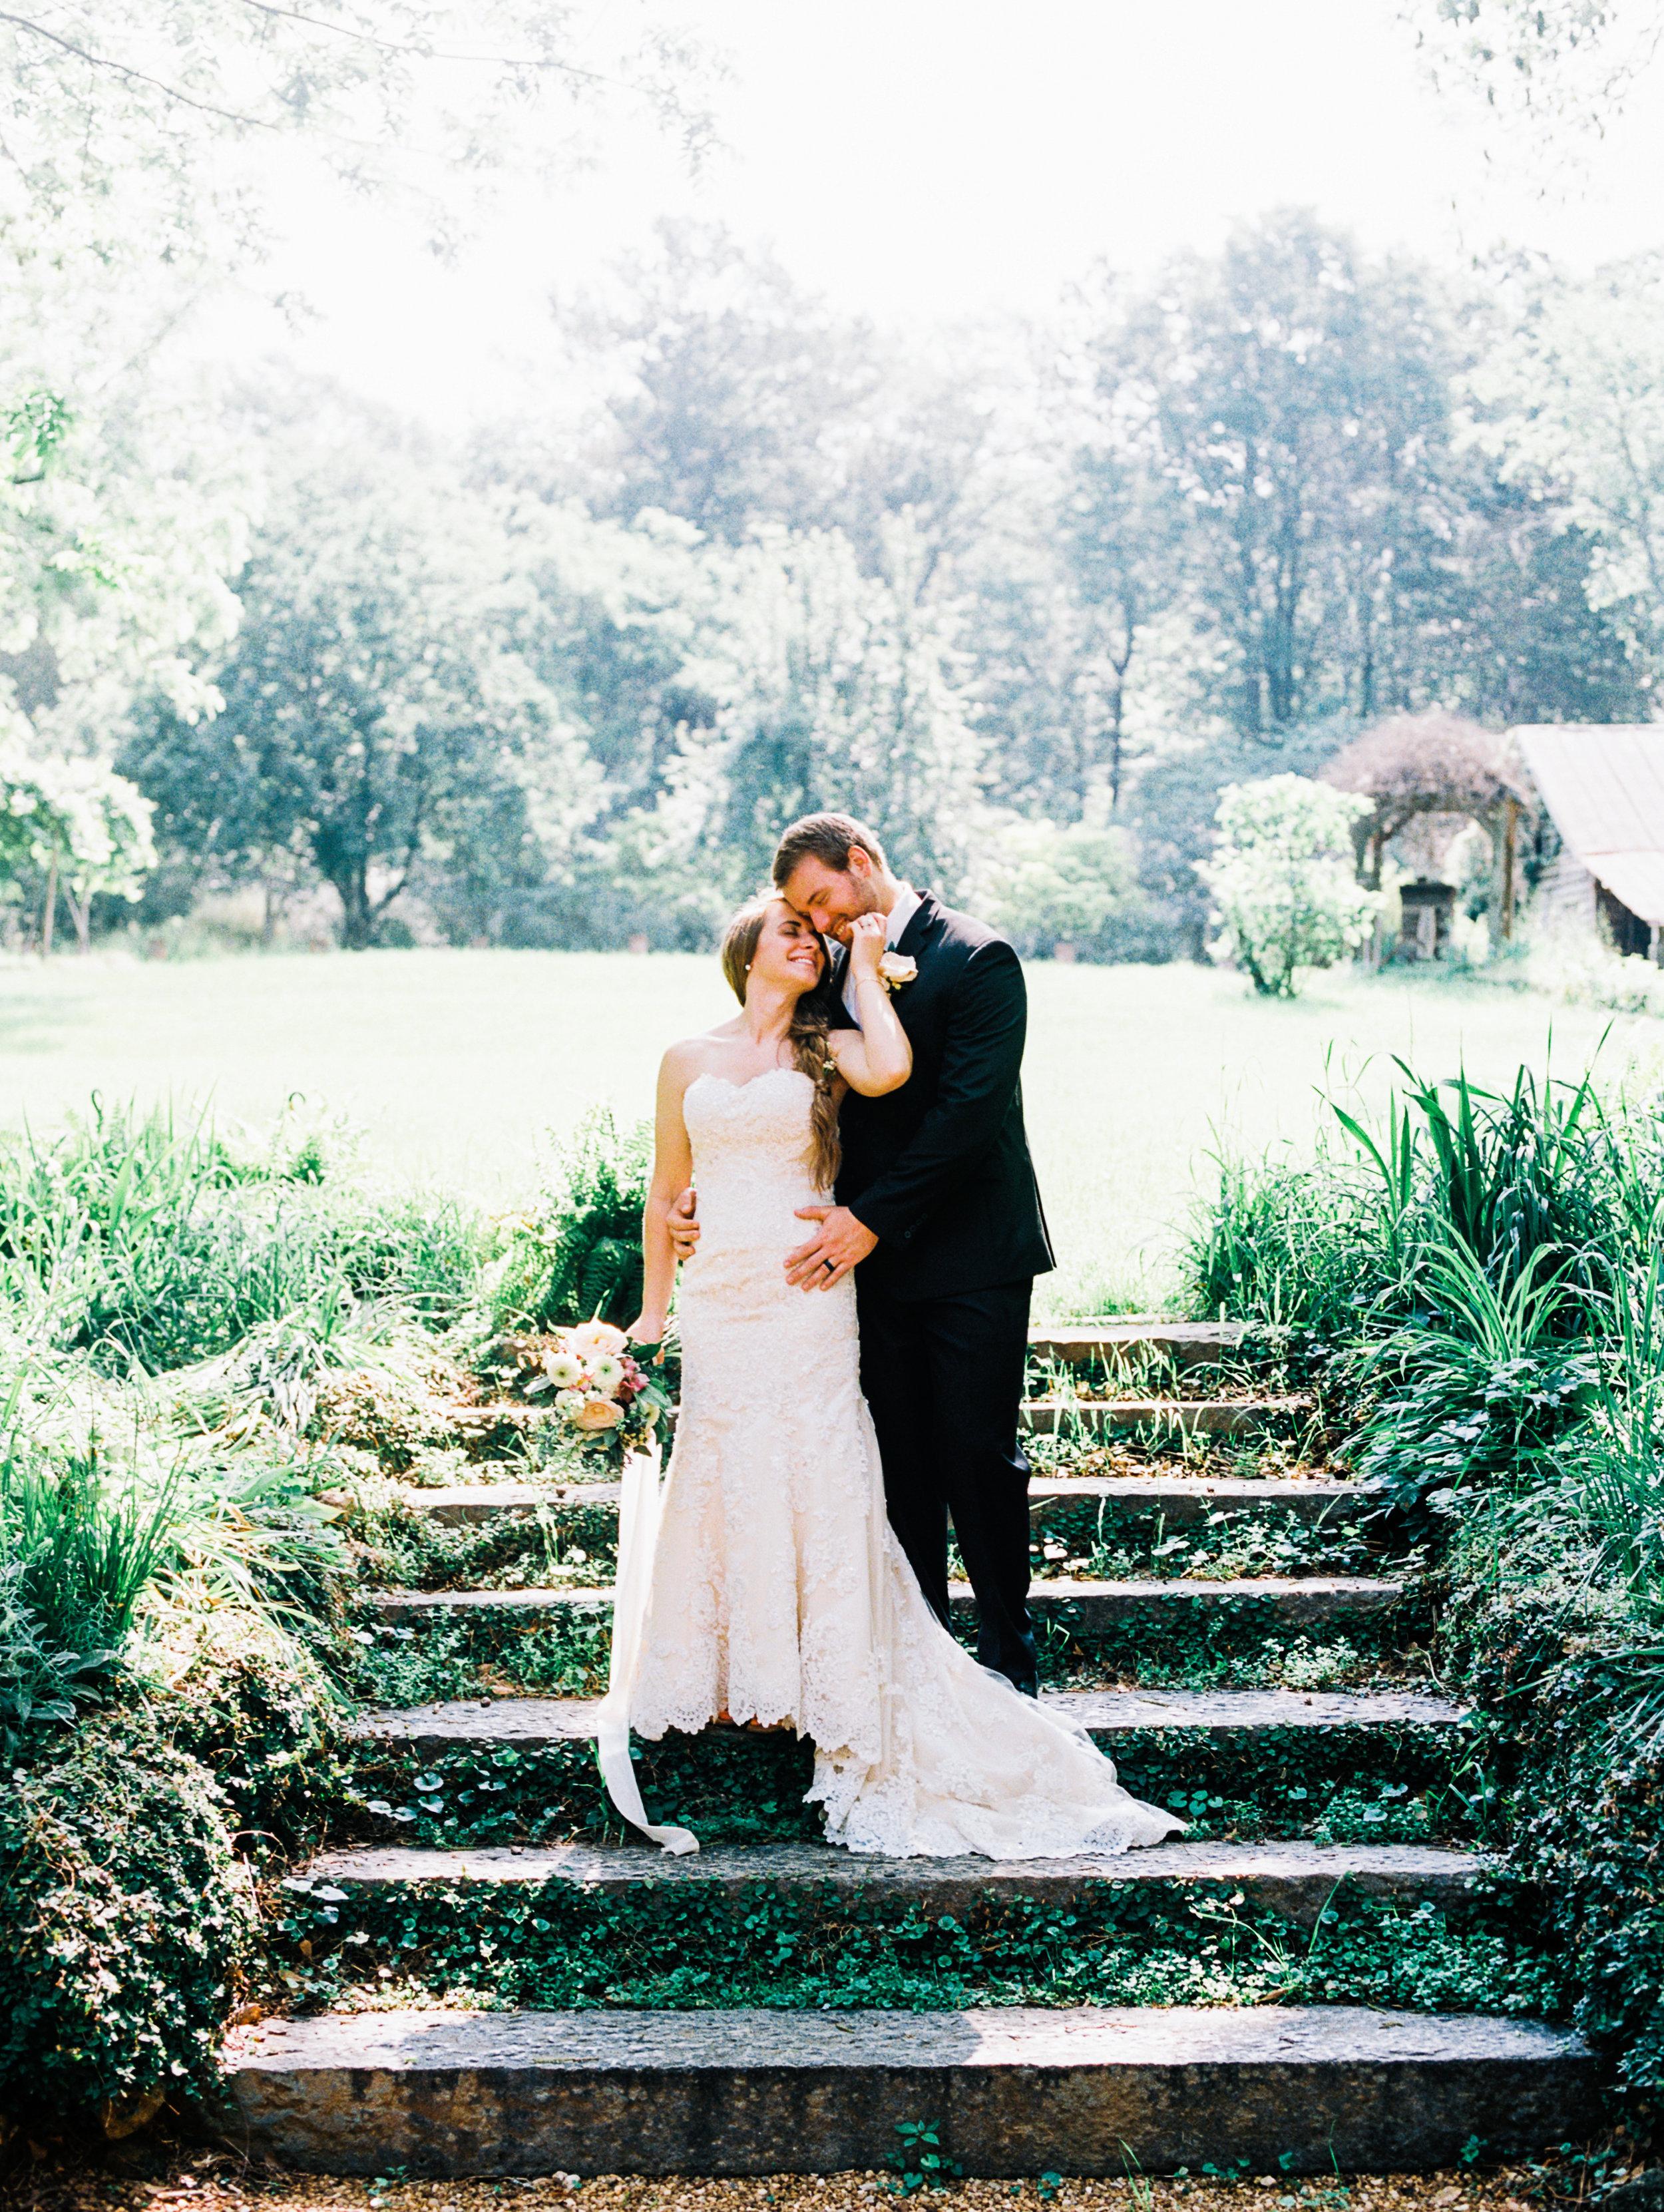 christinadavisphotography-gardenweddinginspiration_romanticwedding11.jpg